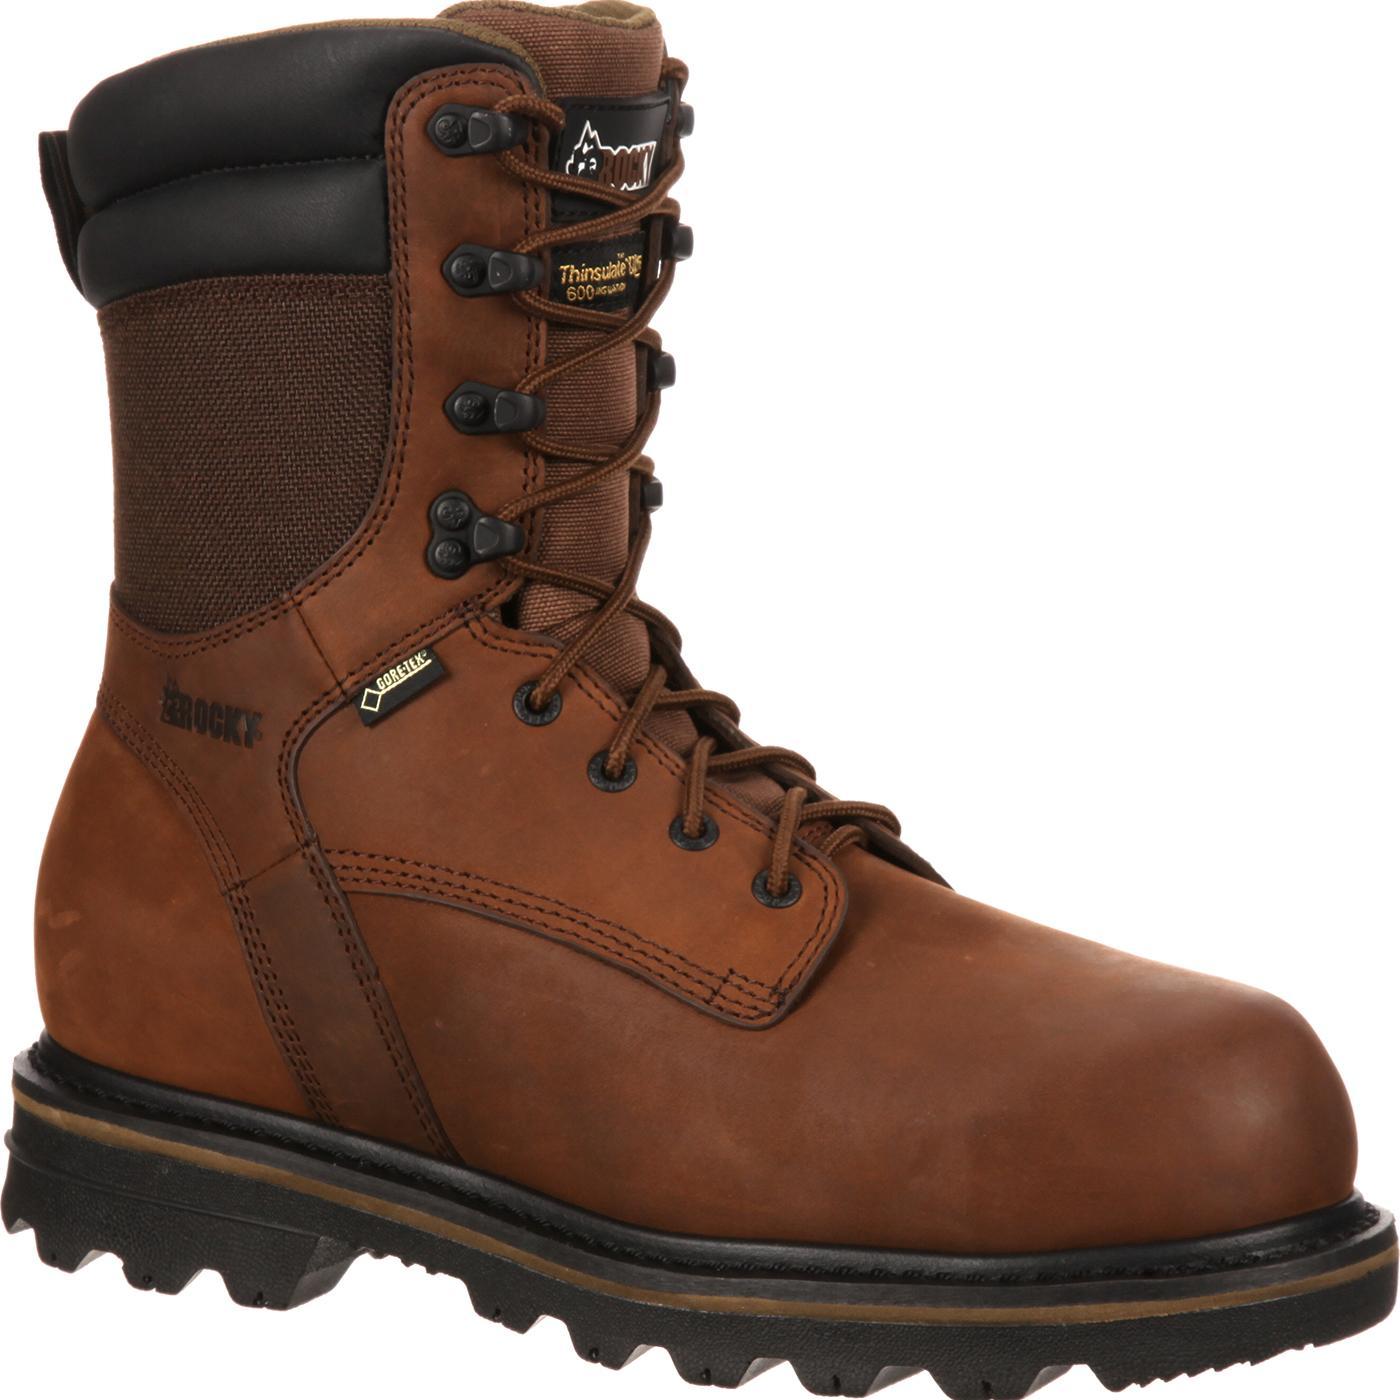 best deals on dirt cheap best selling Rocky Cornstalker Composite Toe GORE-TEX® Waterproof Insulated Work Boot